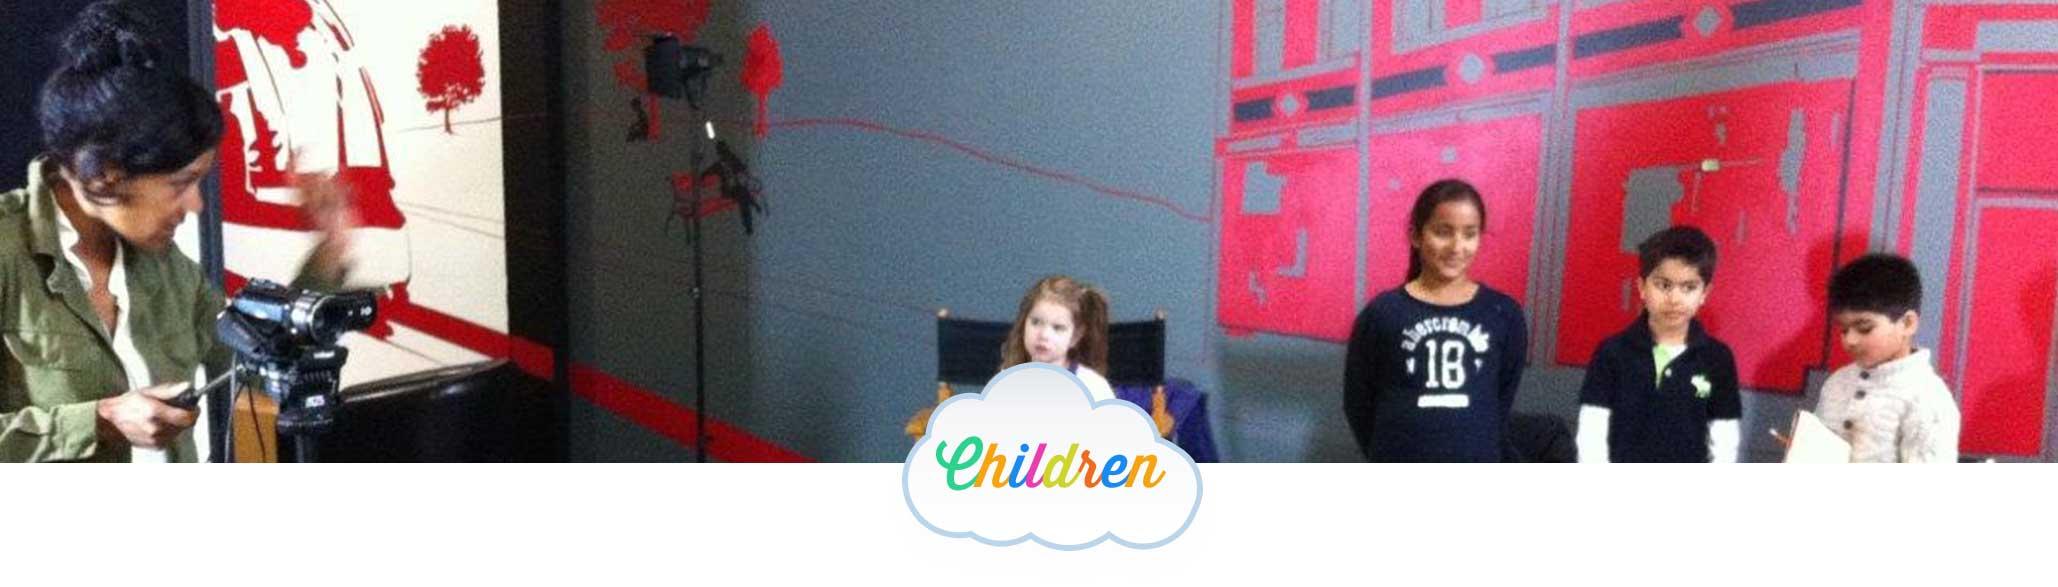 Children on camera acting